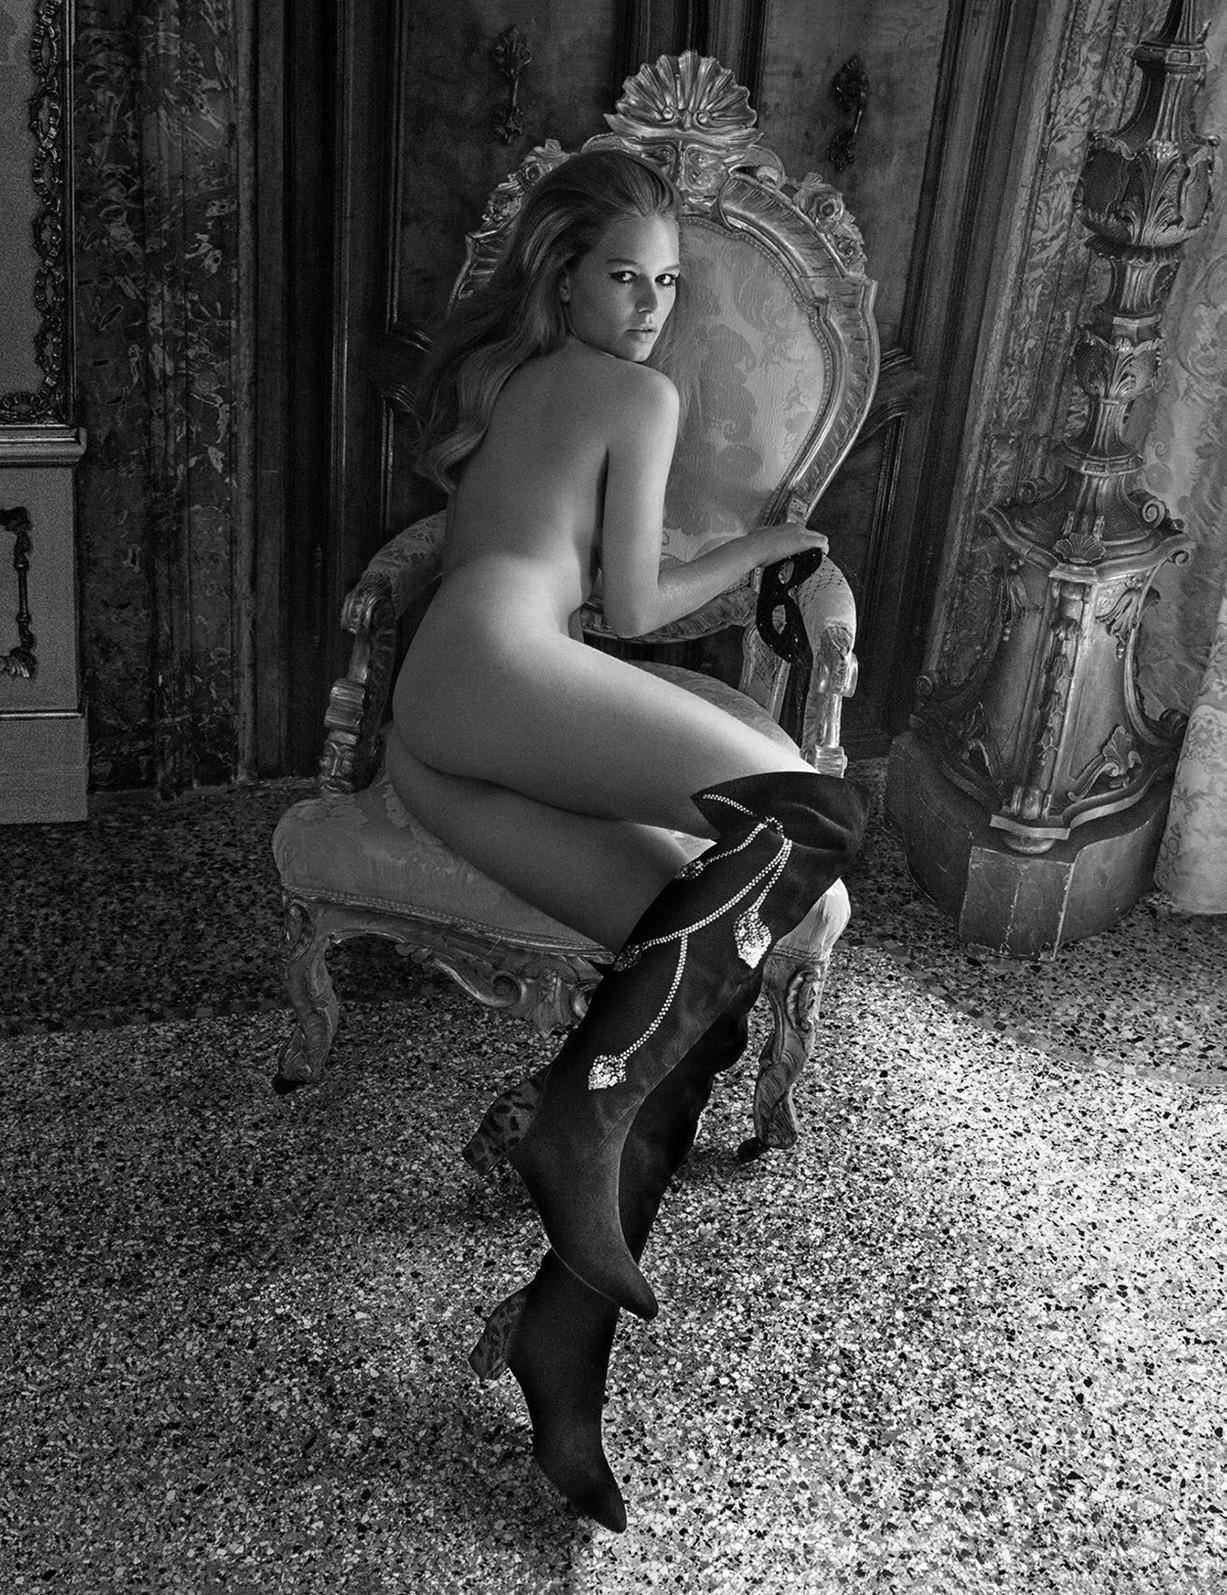 Венецианский шик с Анной Эверс / Anna Ewers by Inez van Lamsweerde and Vinoodh Matadin - Vogue Paris november 2017